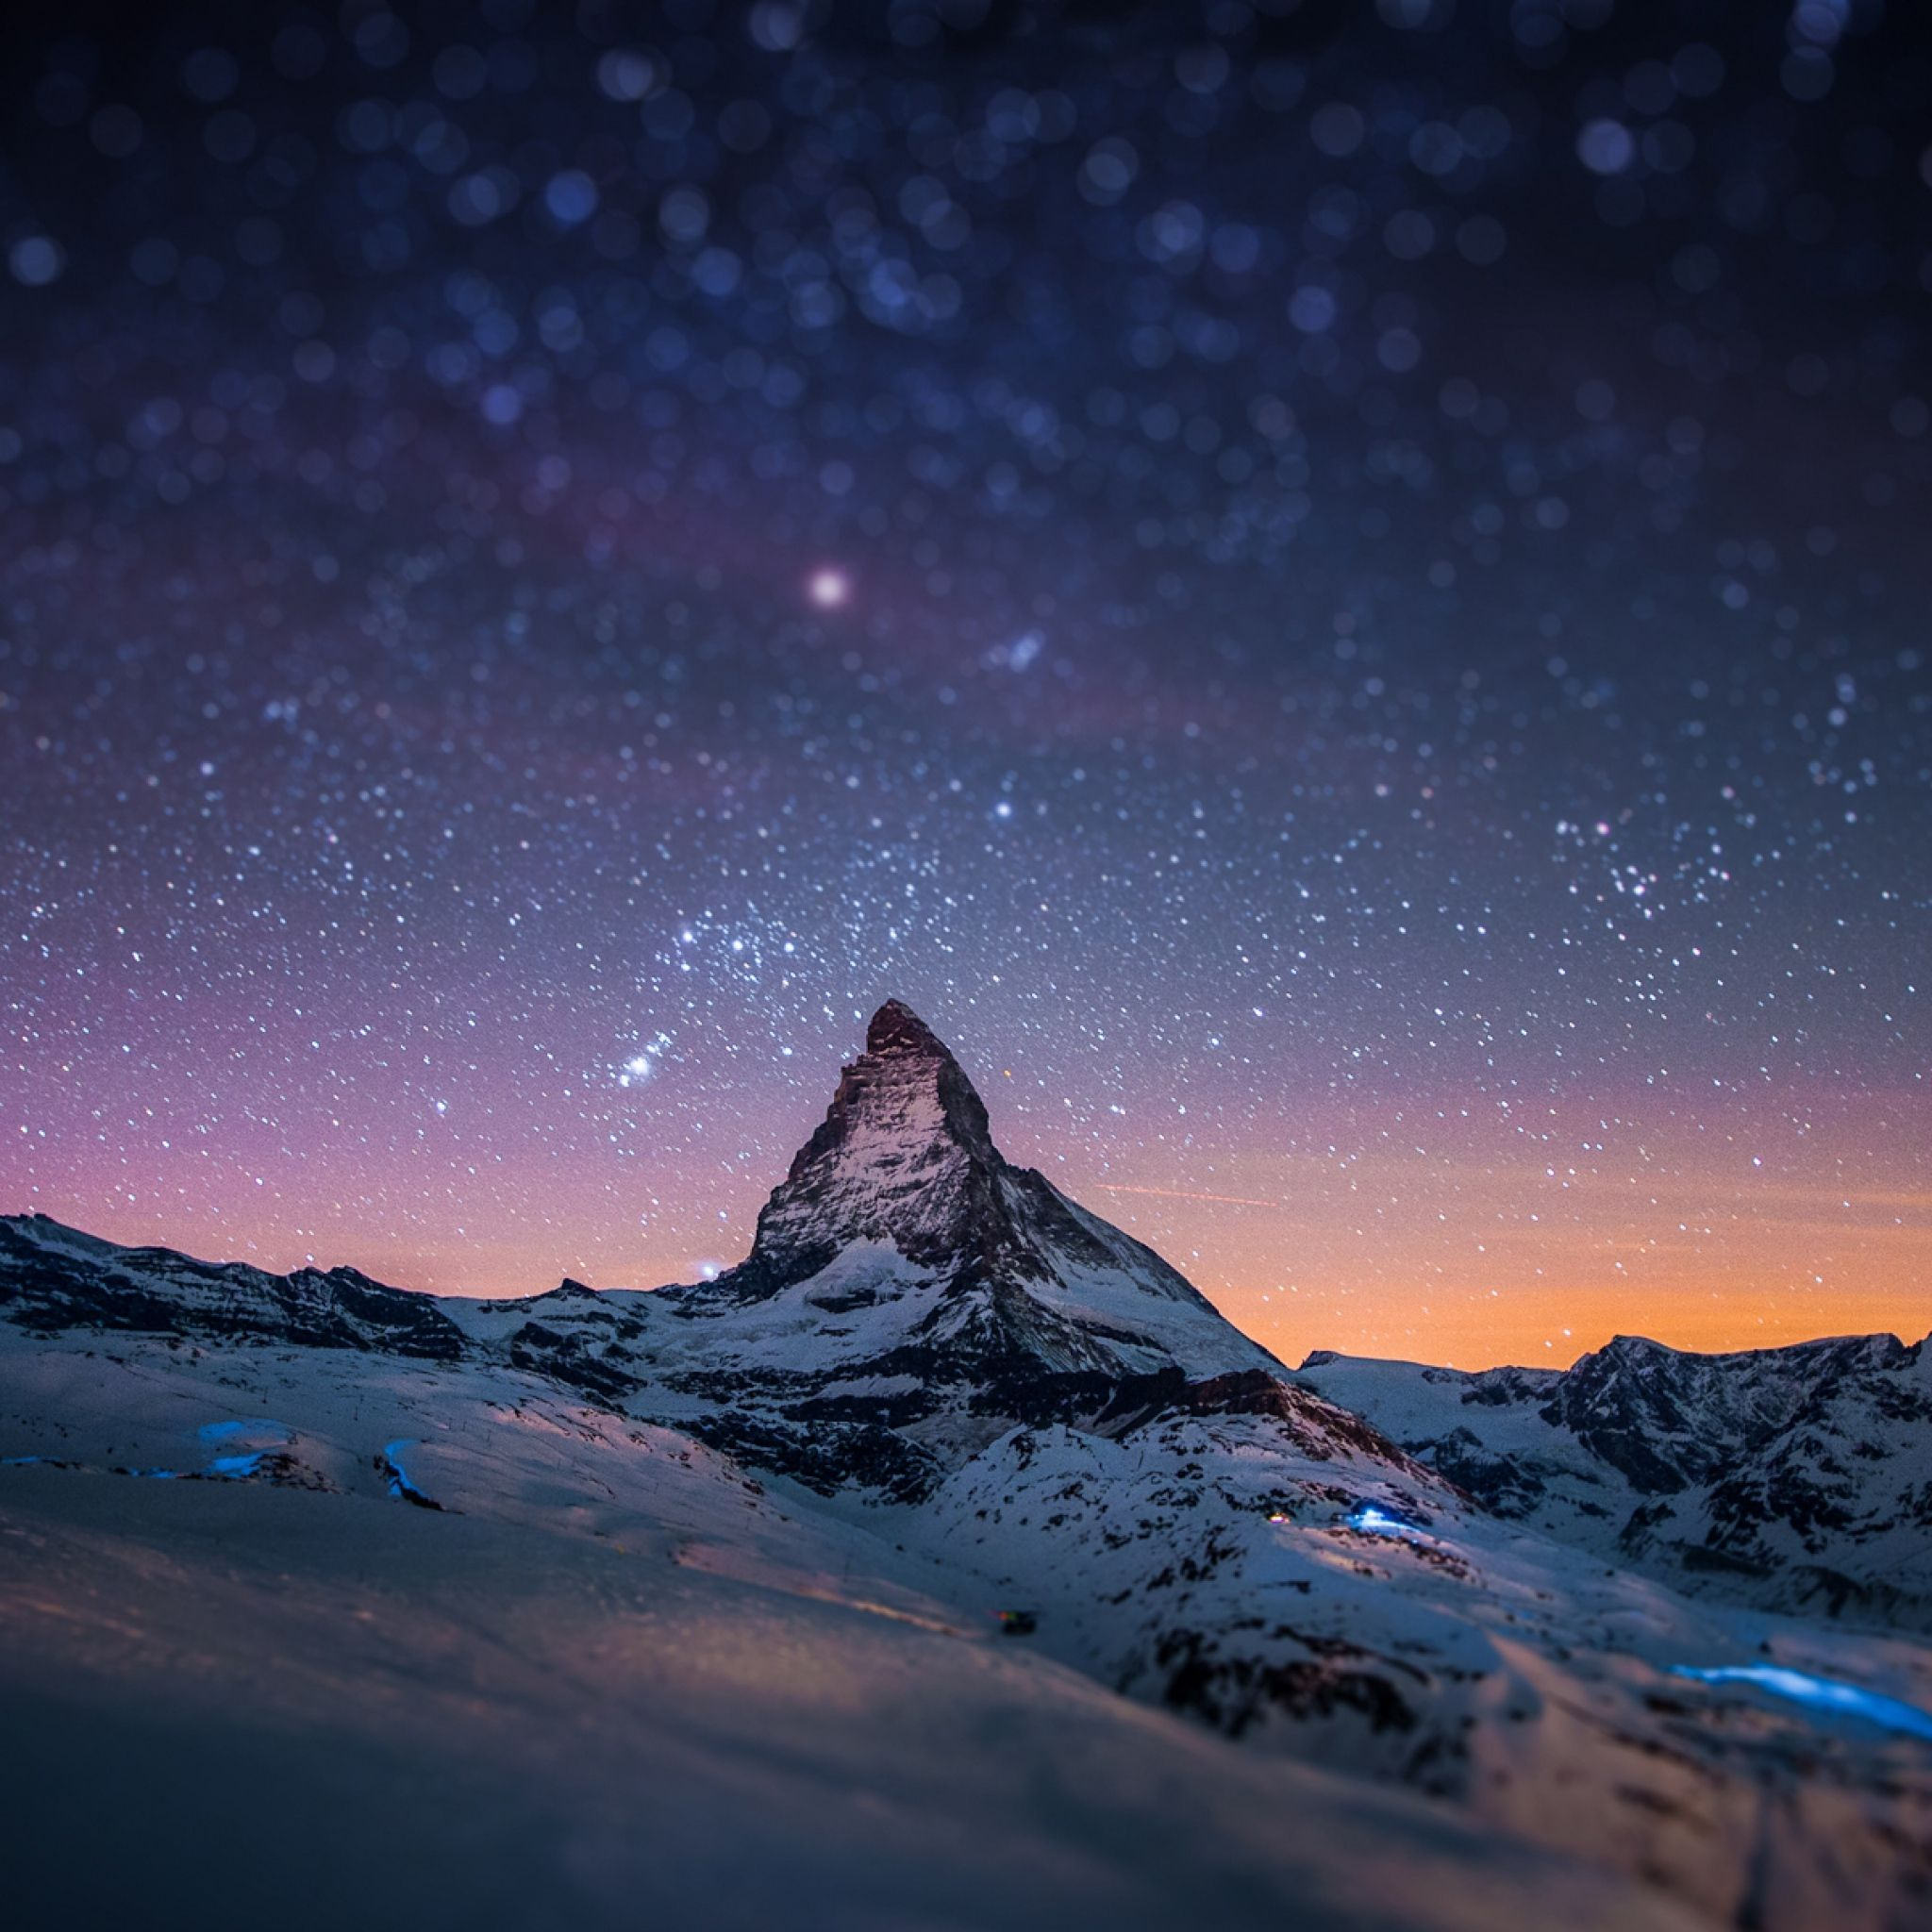 2048x2048 wallpaper mountain, peak, stars, sky, night, light, snow